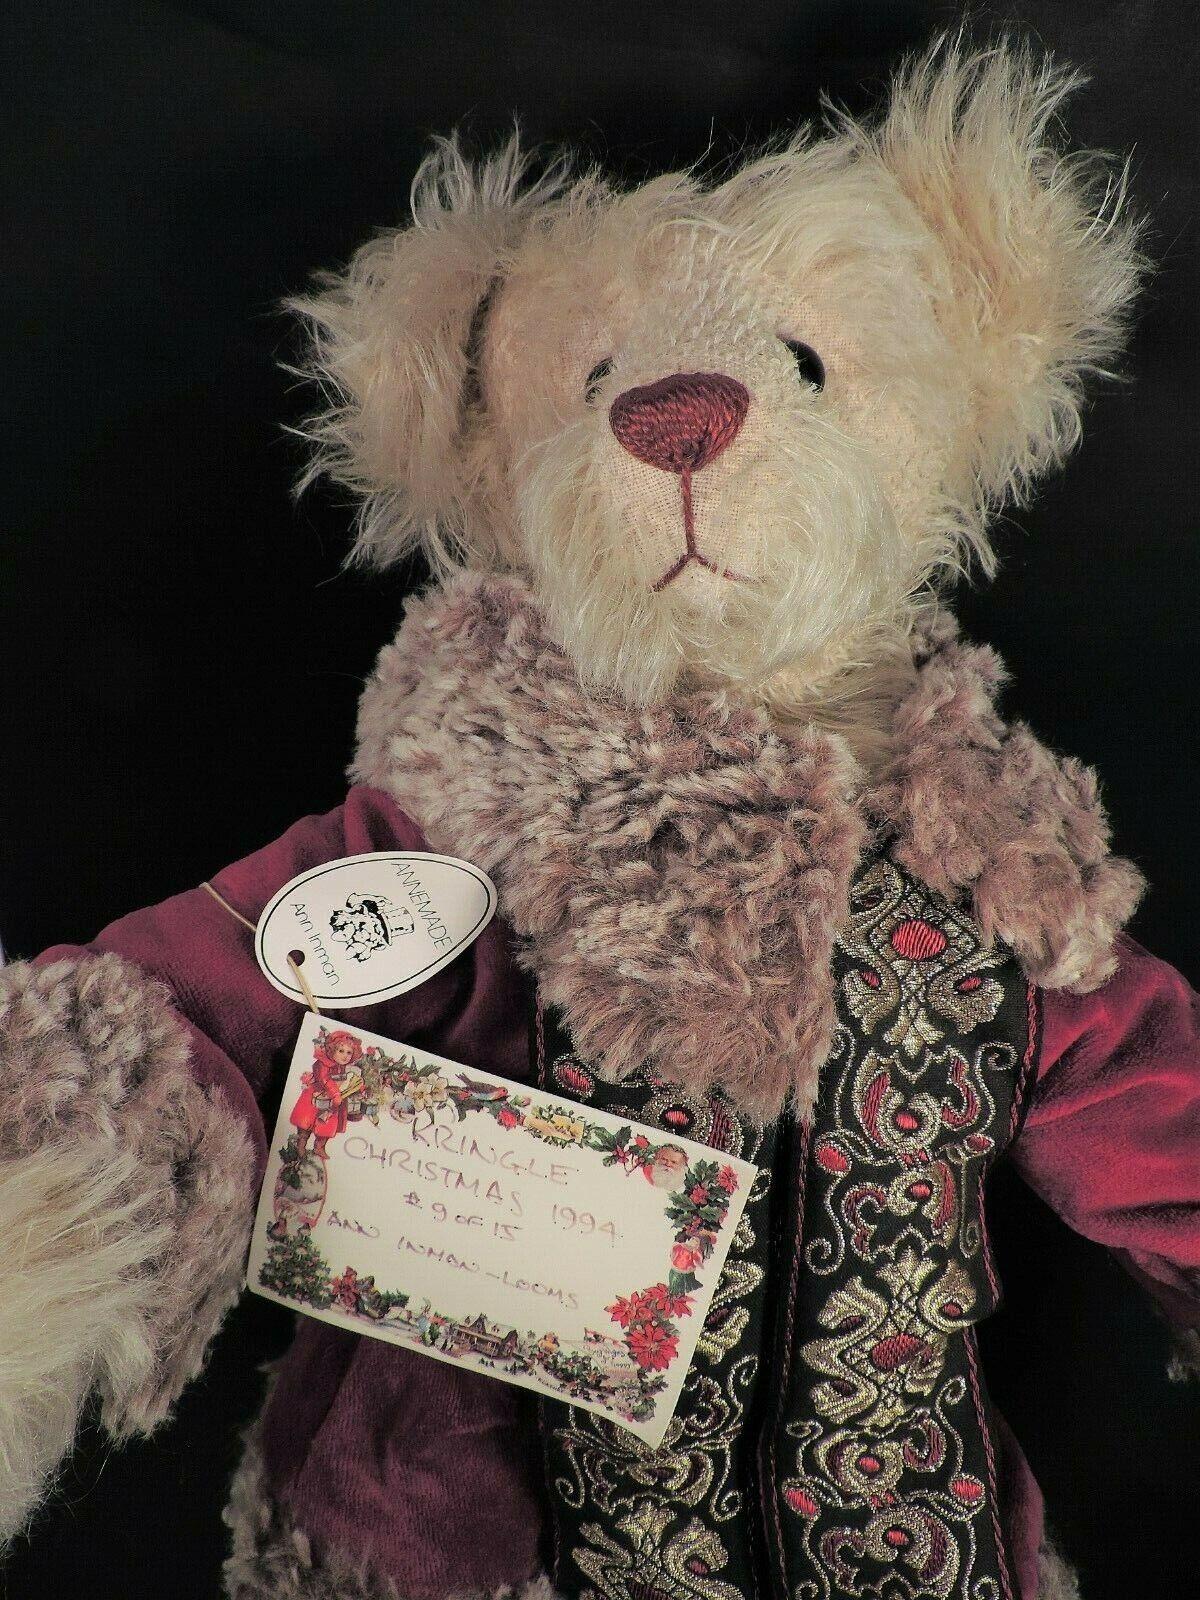 Original ANN INMAN-LOOMS LTD EDITION TEDDY BEAR (PRINGLE CHRISTMAS 1994) MWT